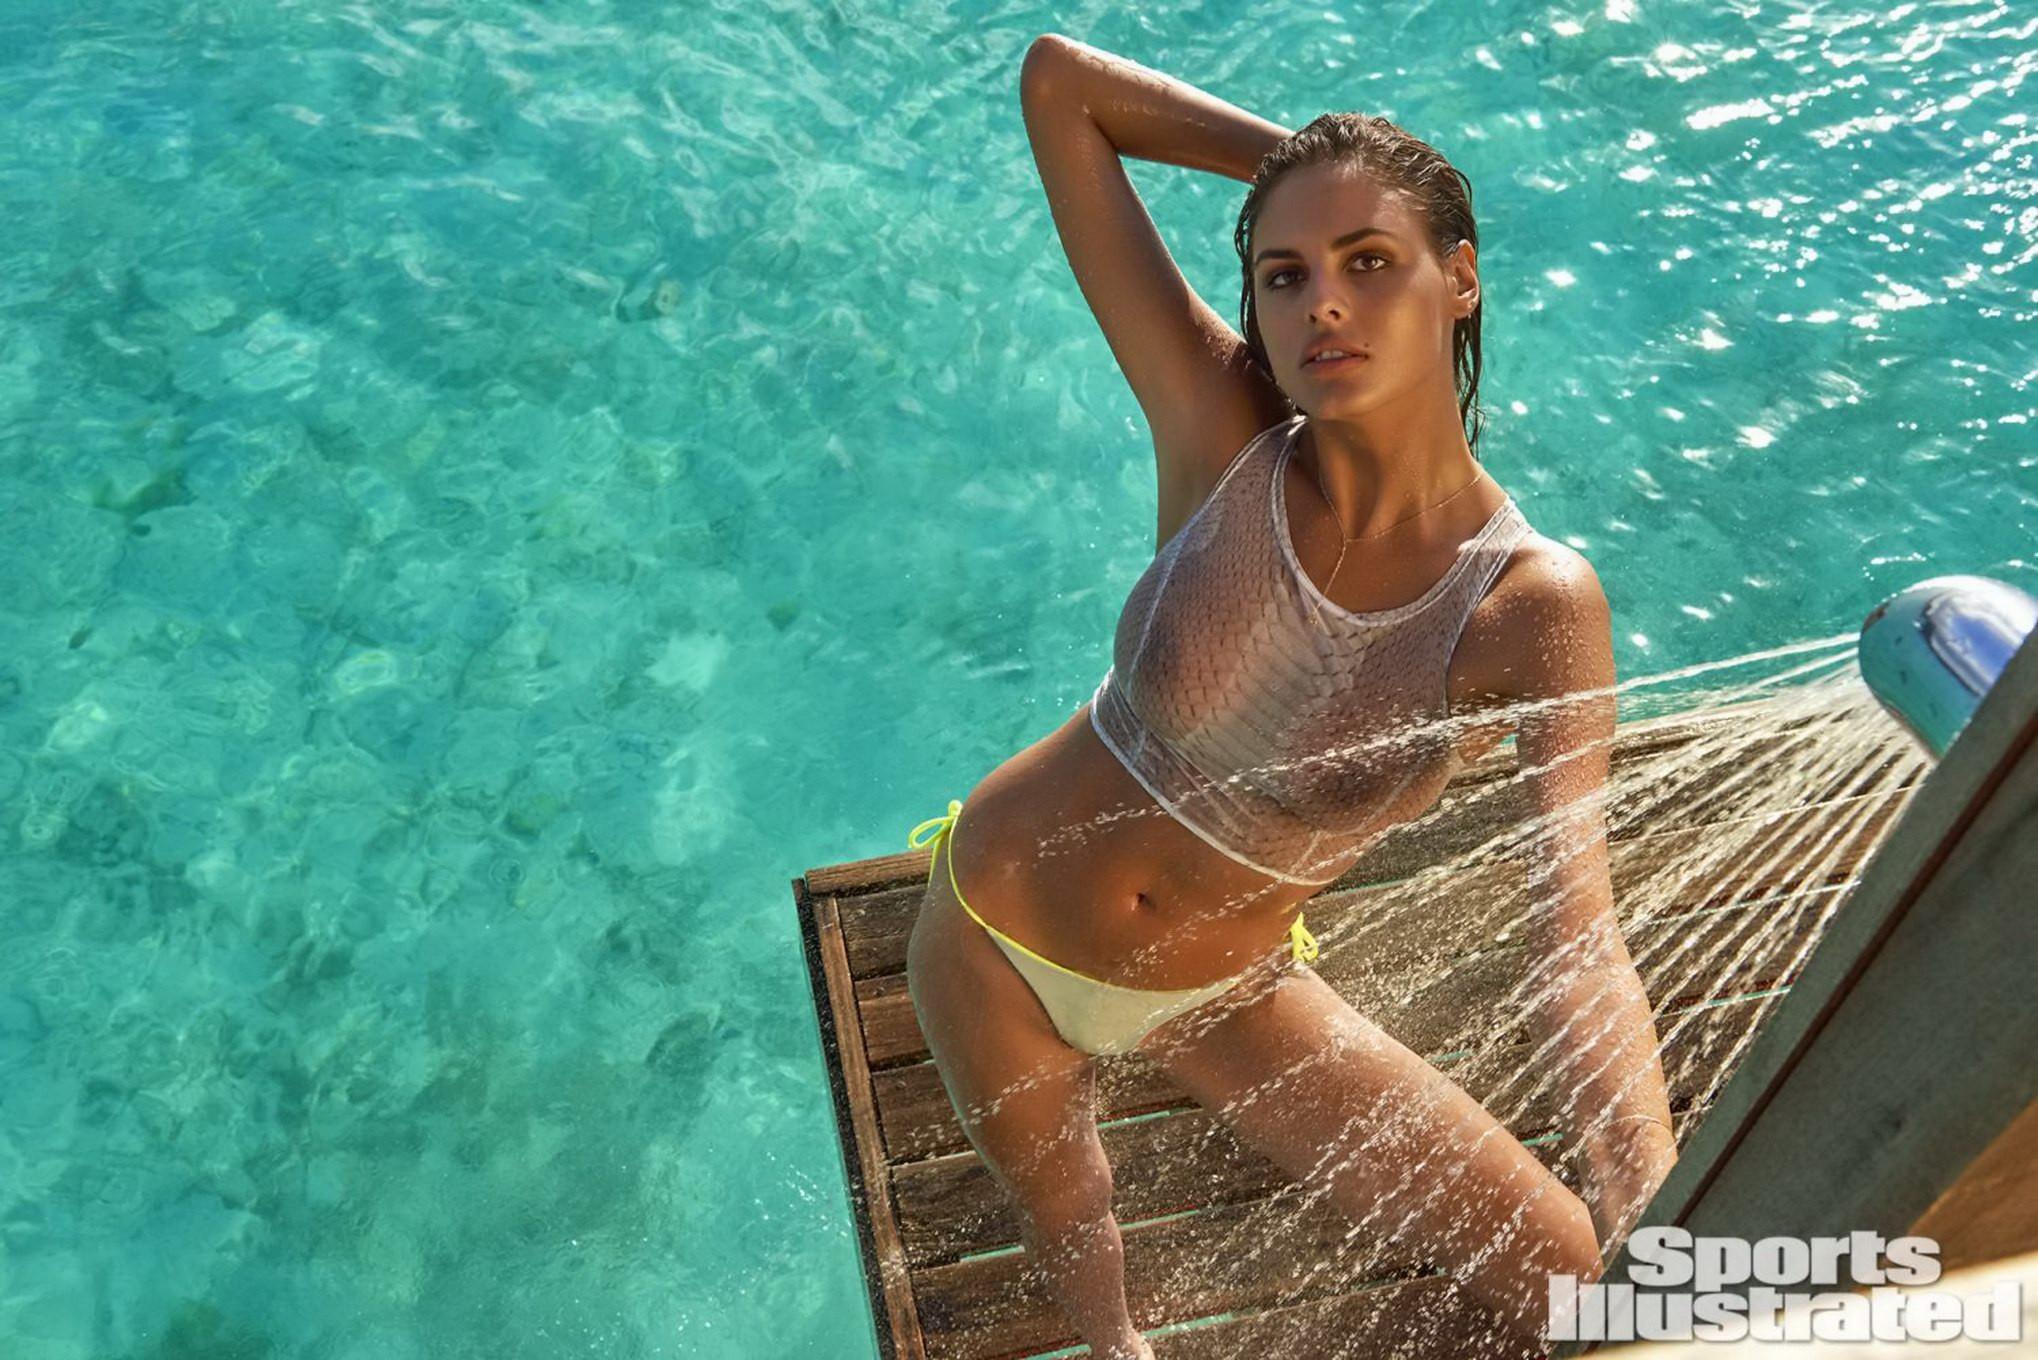 Bojana krsmanovic tits - 2019 year